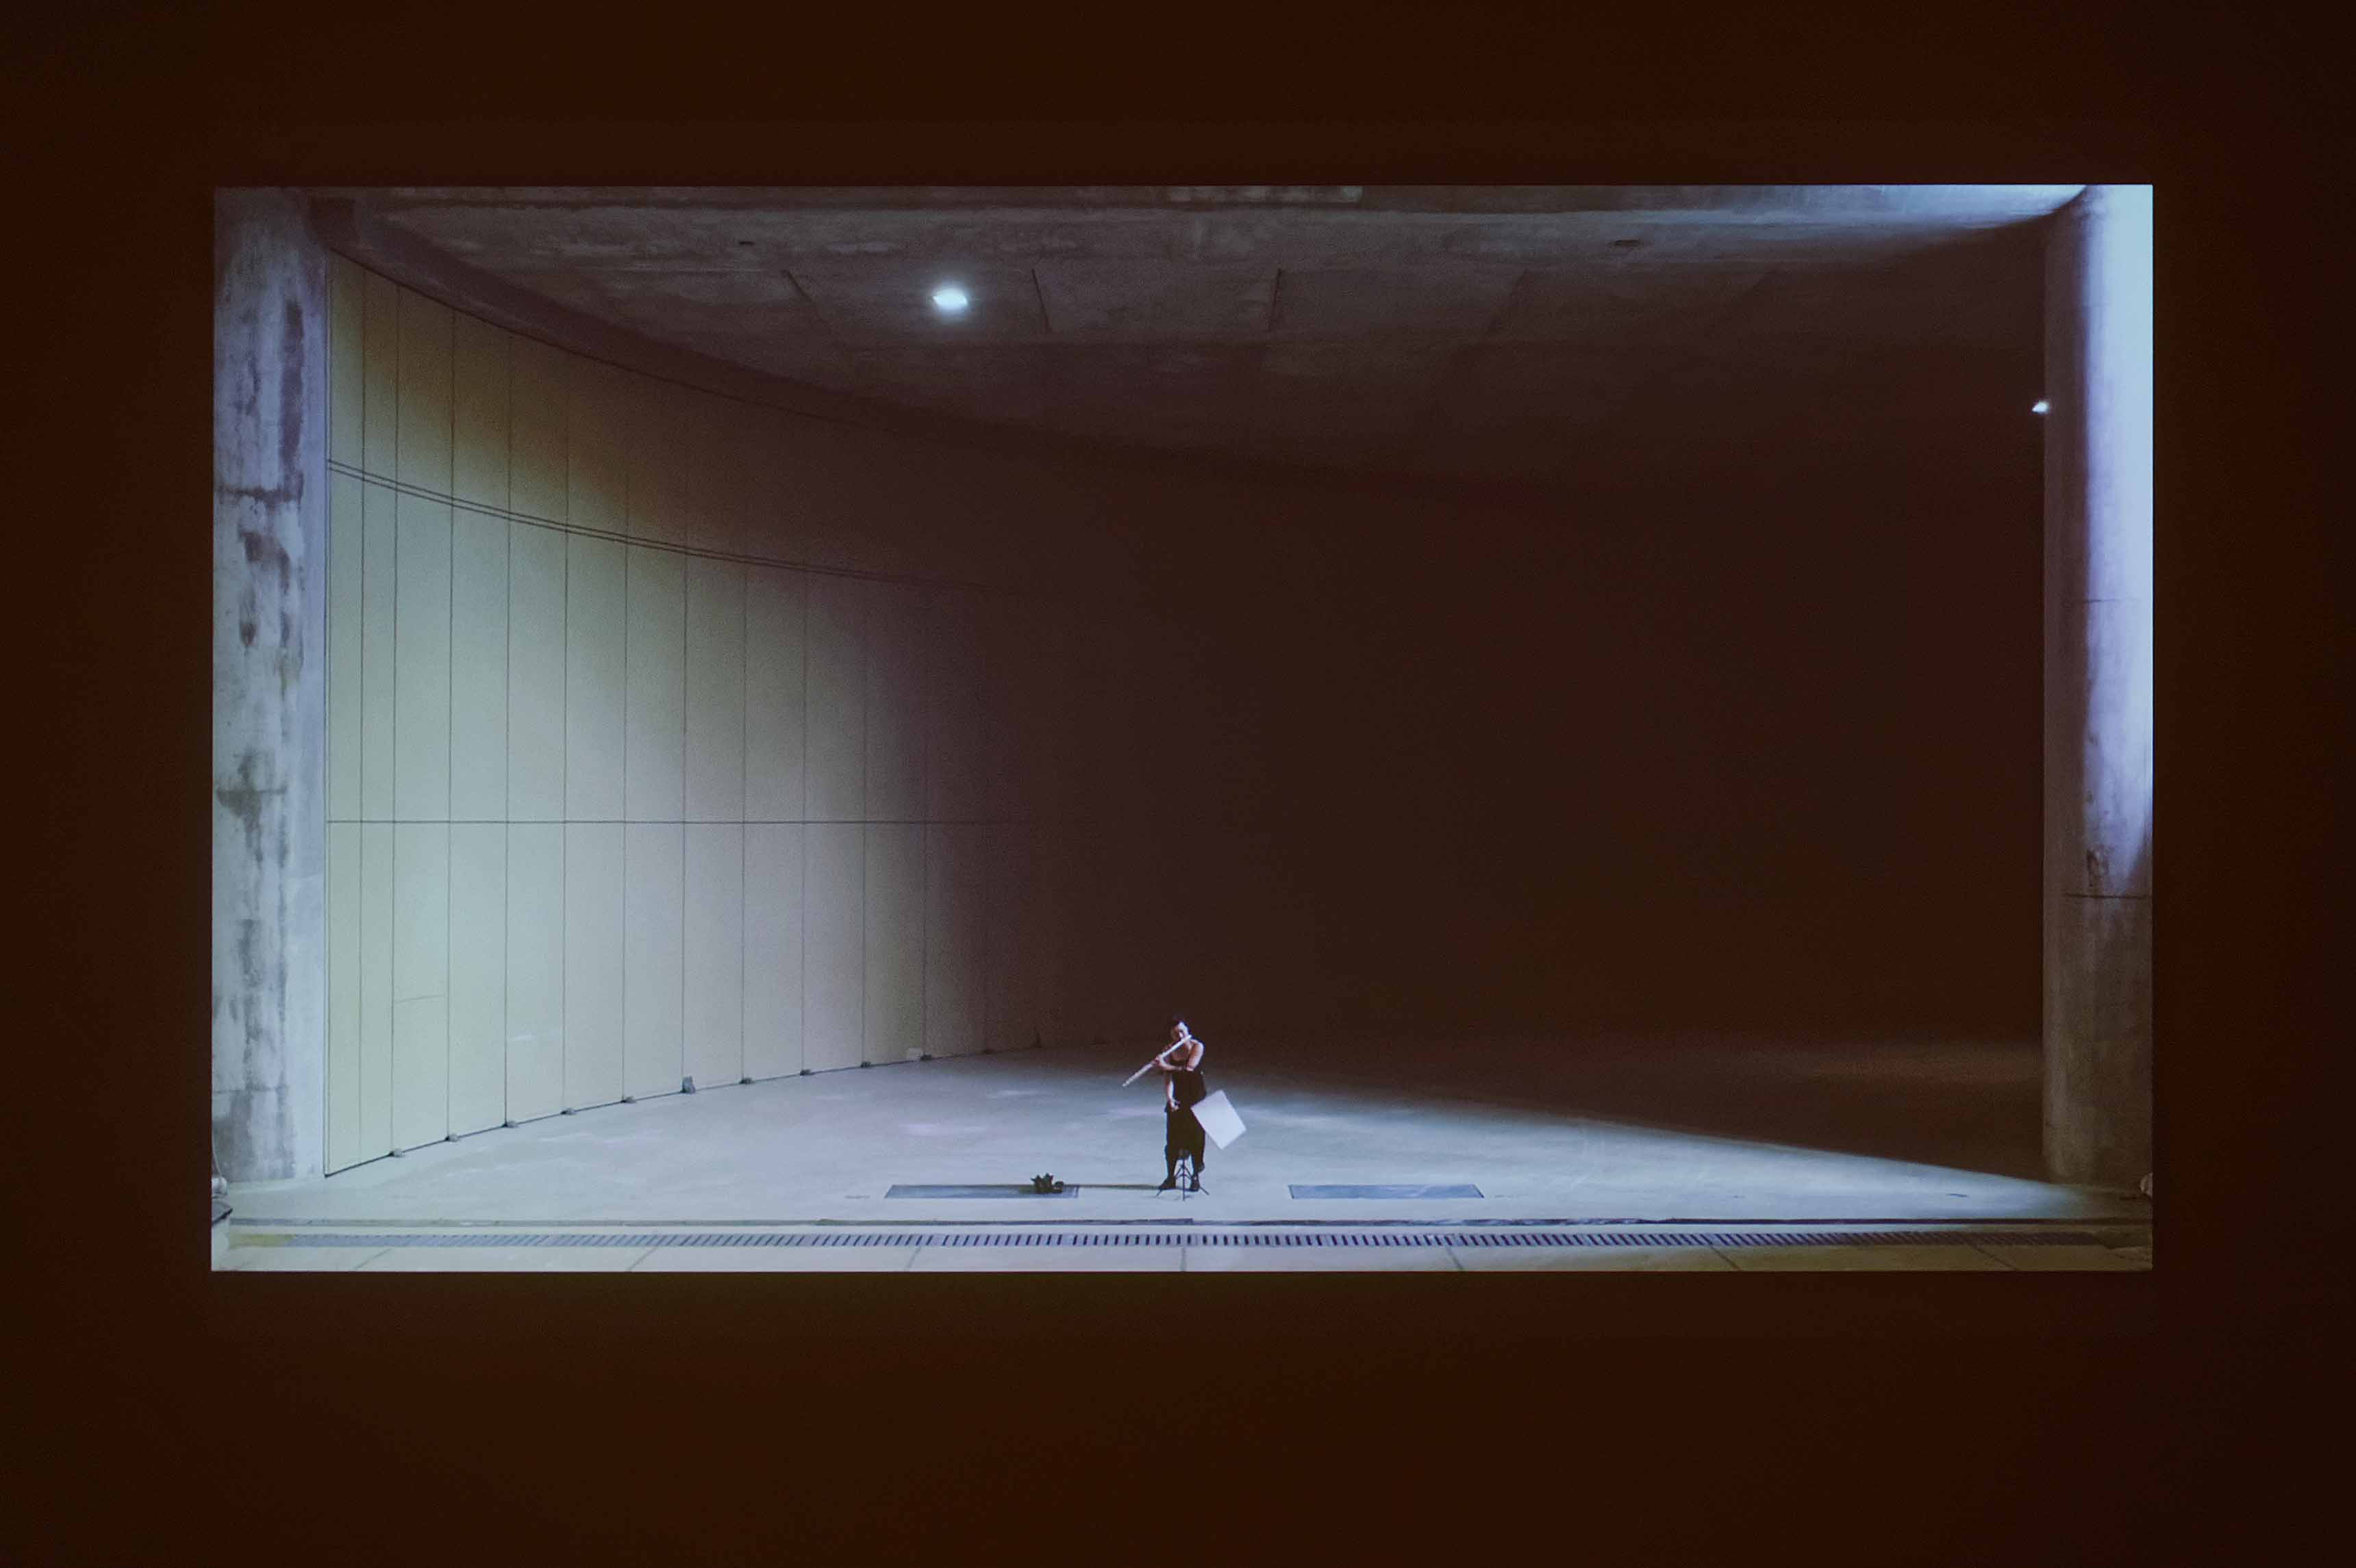 ORTEGA Fernando, Flute concert film, 2017, Courtesy de l'artiste, Biennale de Lyon 2017 © Blaise adilon